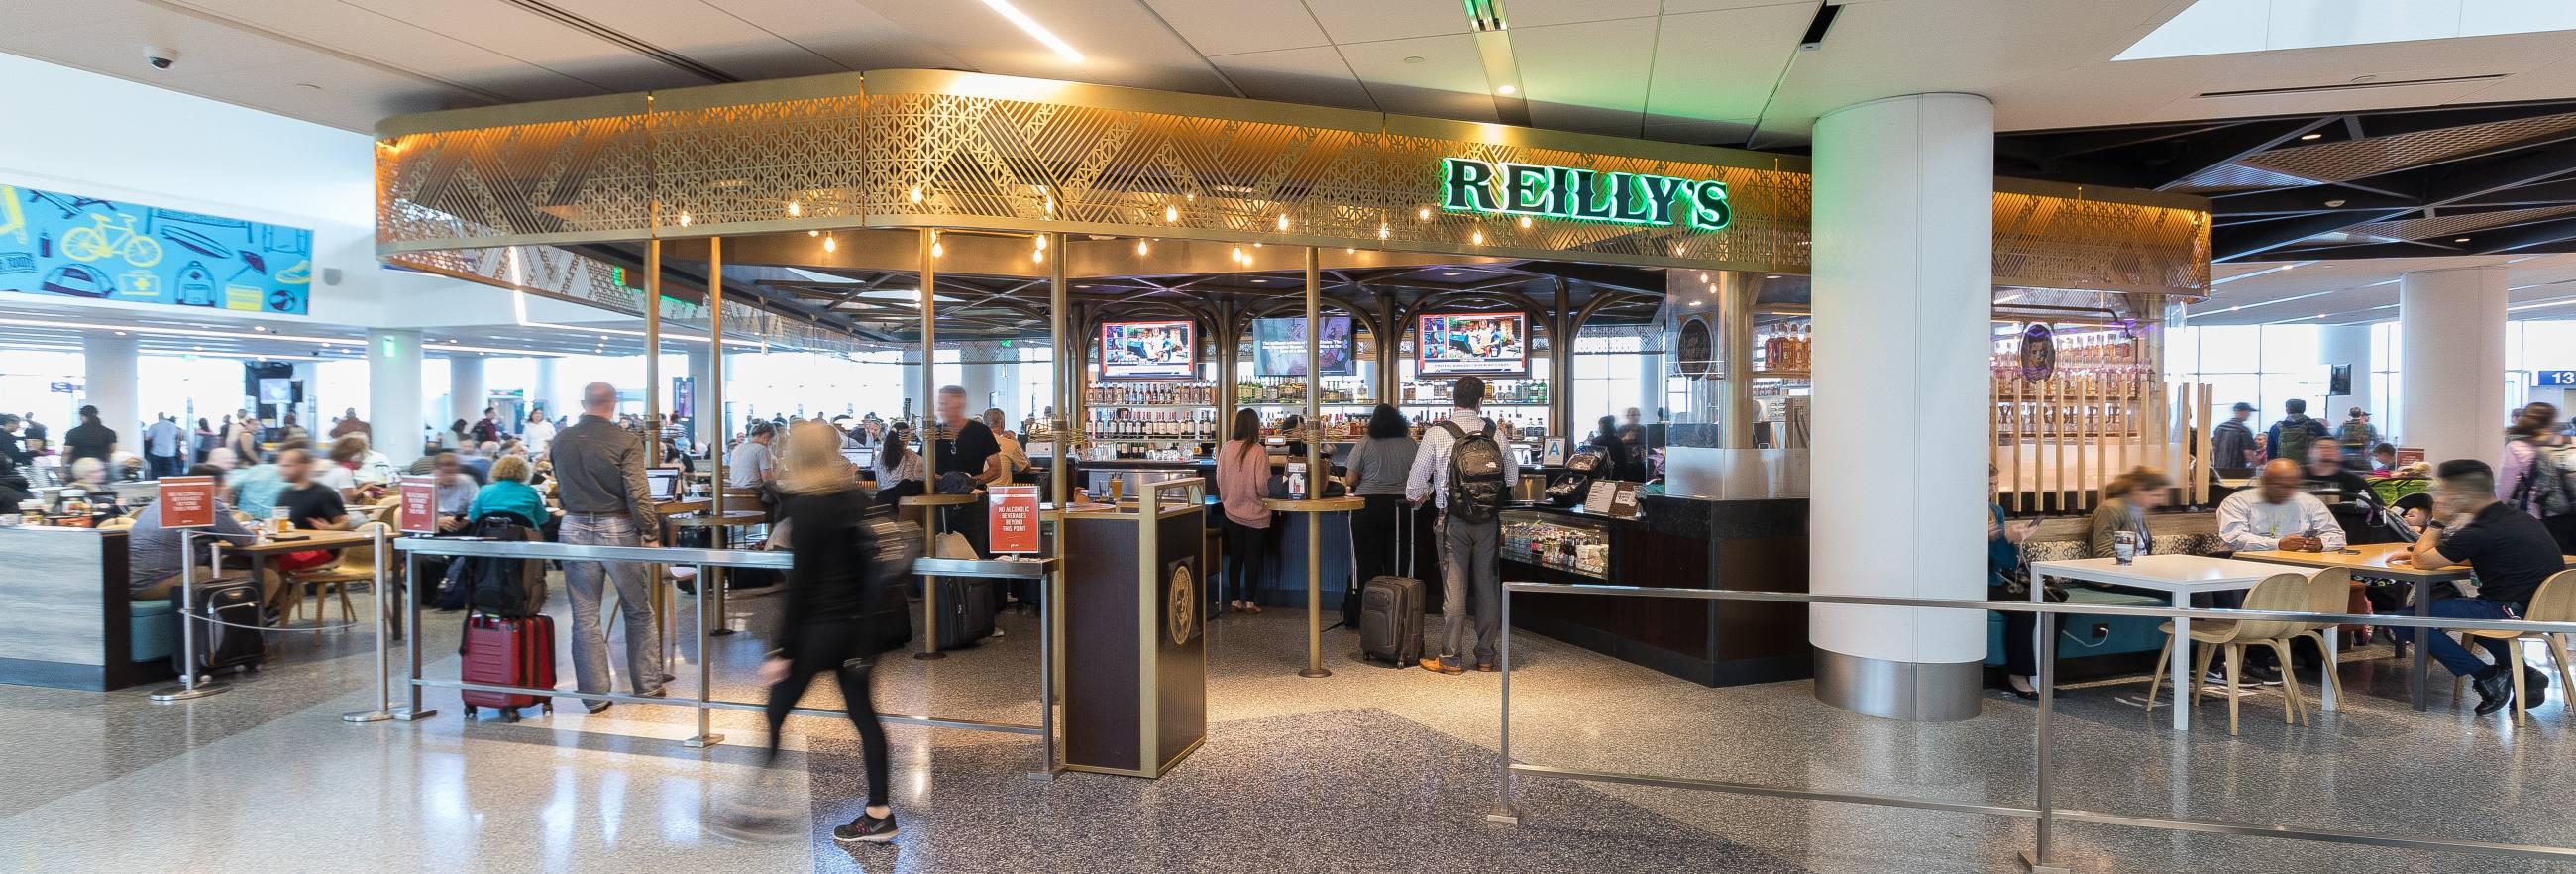 Reilly's Irish Pub at LAX Terminal 1